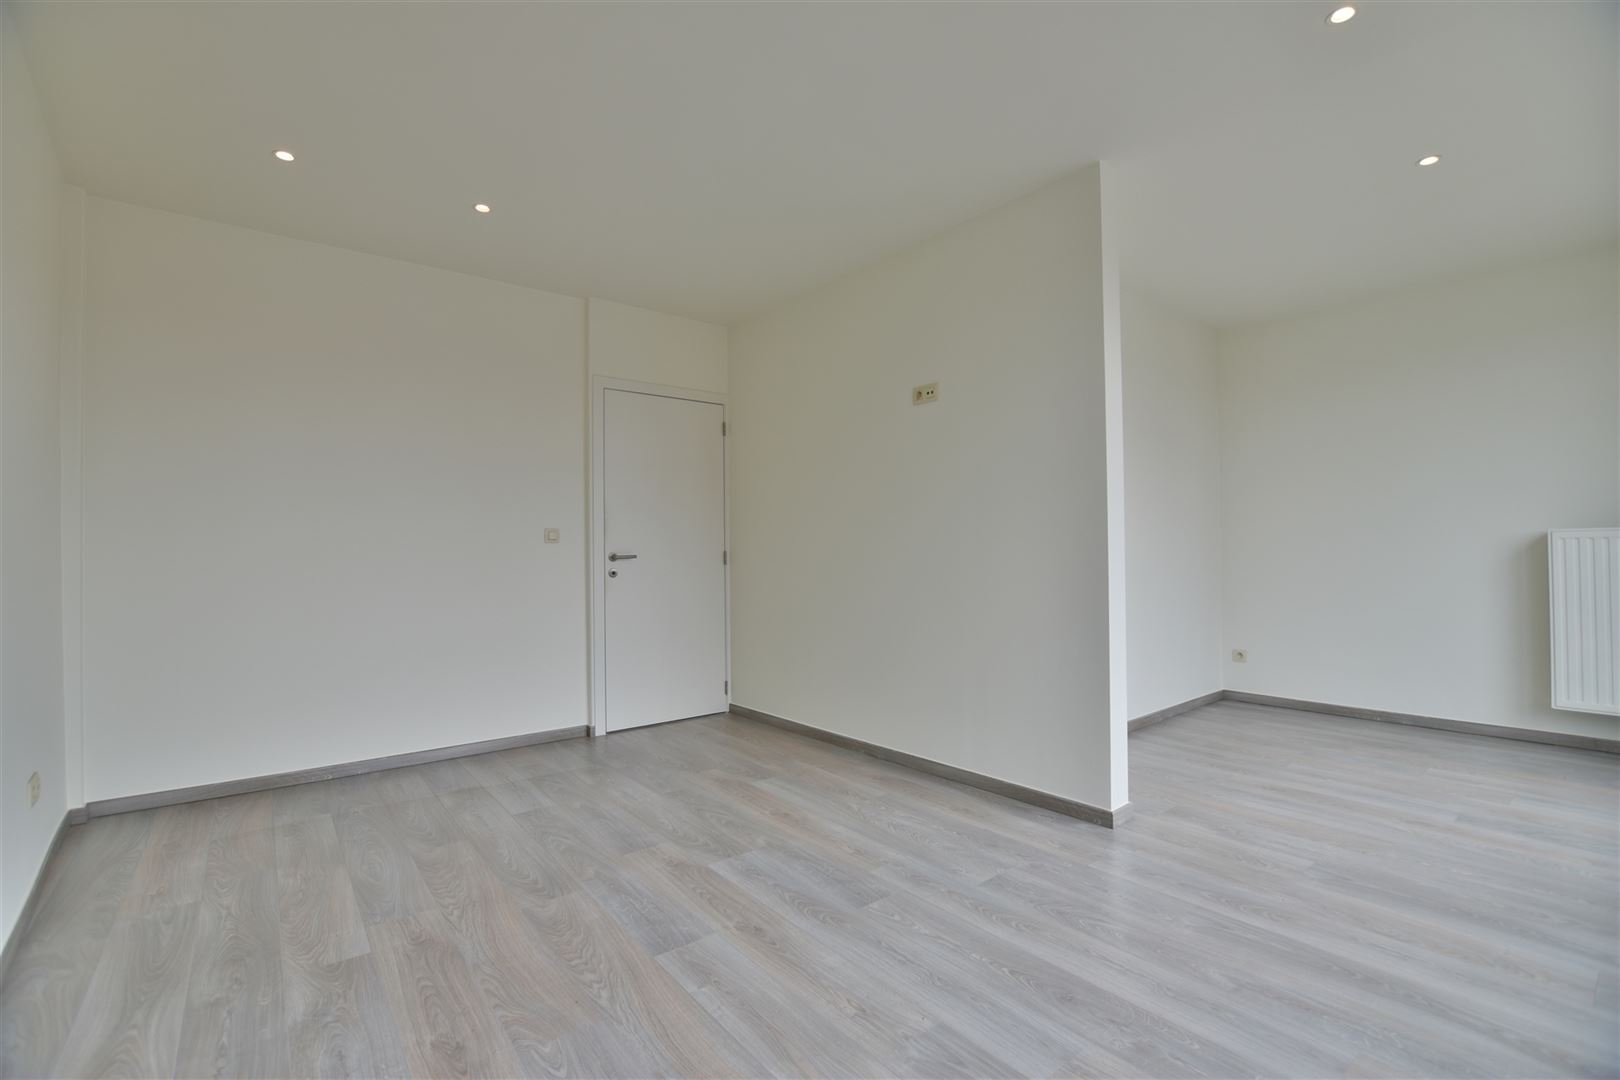 Foto 18 : Duplex/Penthouse te 9200 Sint-Gillis-bij-Dendermonde (België) - Prijs € 278.000